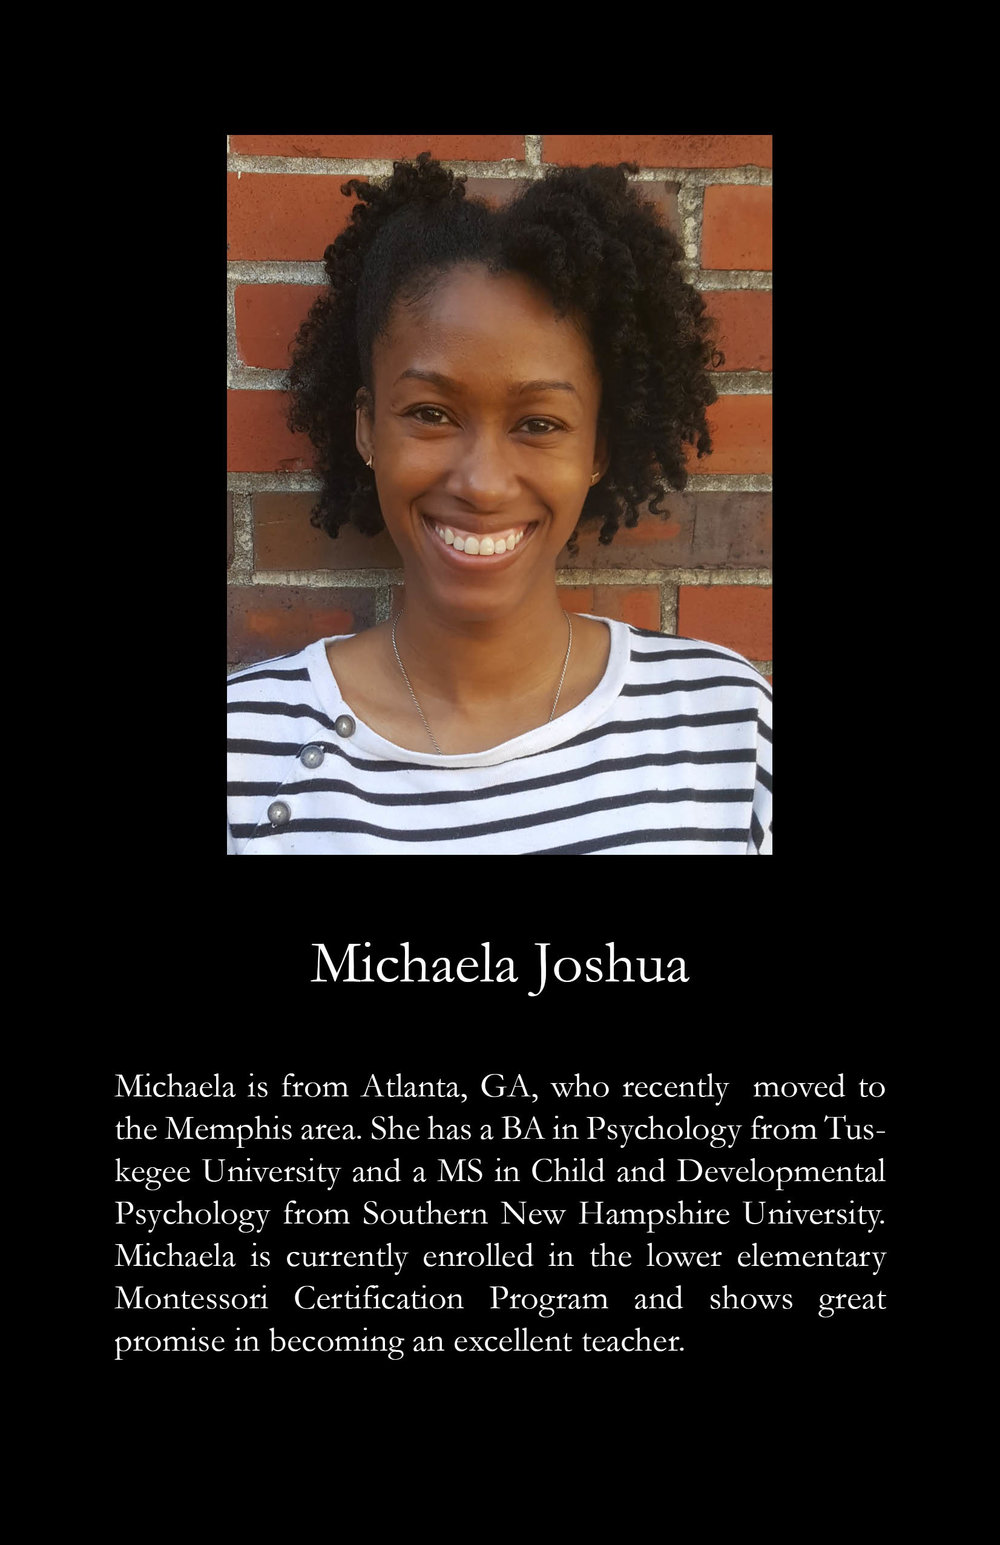 Michaela Joshua.jpg